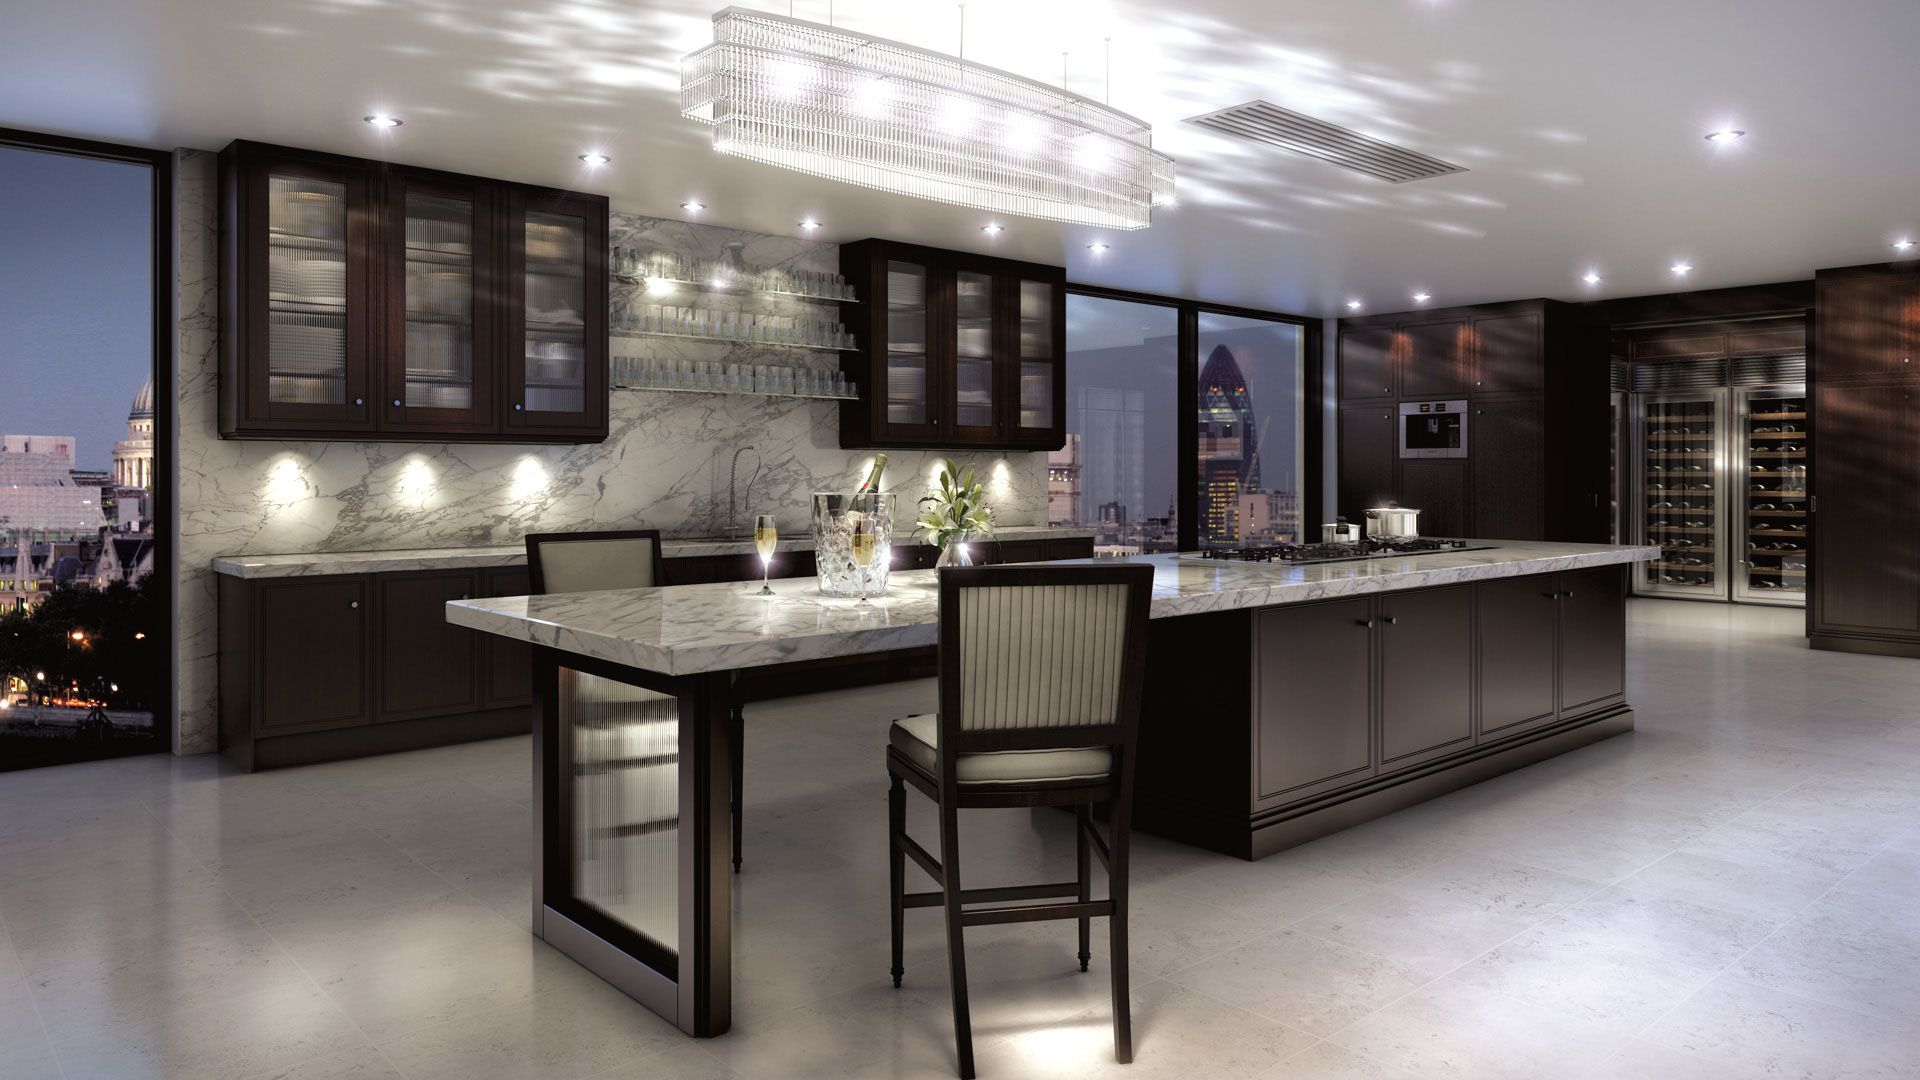 Metro Deco Clive Christian kitchen and design